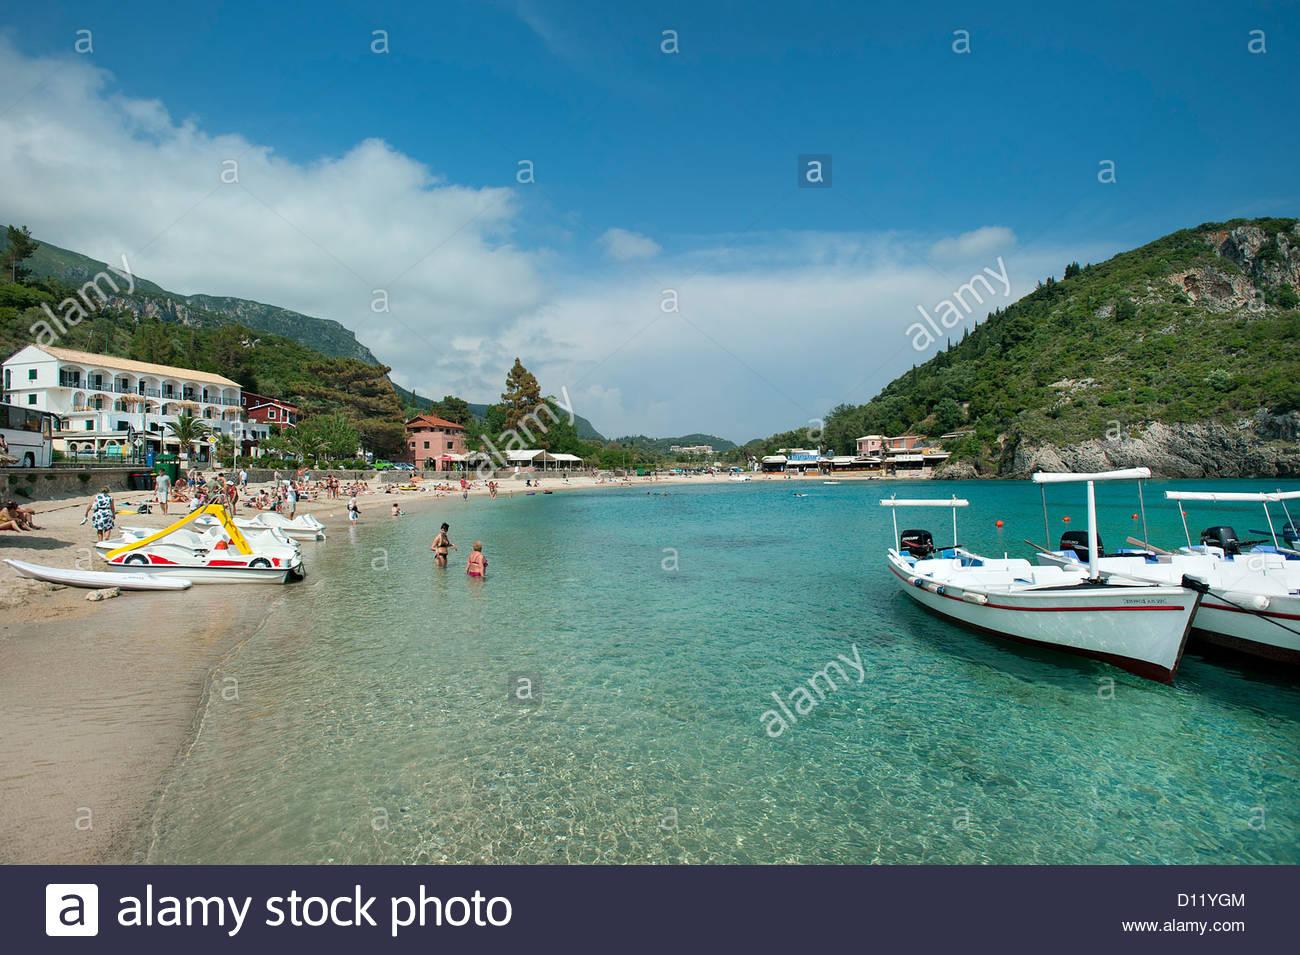 Agios Spiridon Beach, Paleokastritsa, Corfu, Ionian Islands, Greece - Stock Image